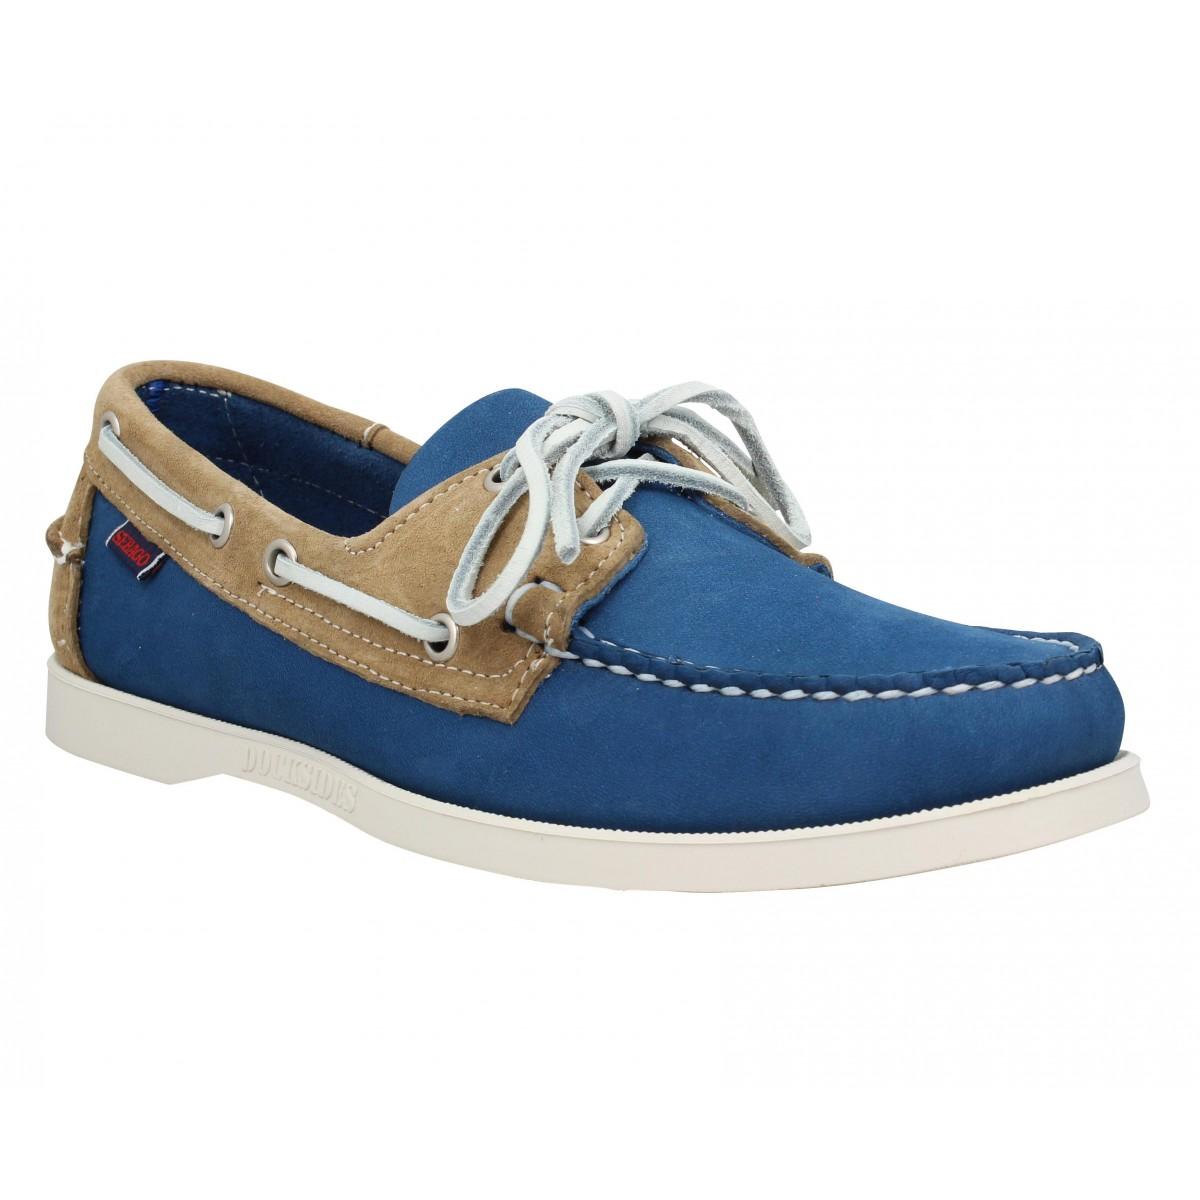 Chaussures bateaux SEBAGO Docksides Spinnaker velours Homme Bleu + Sable